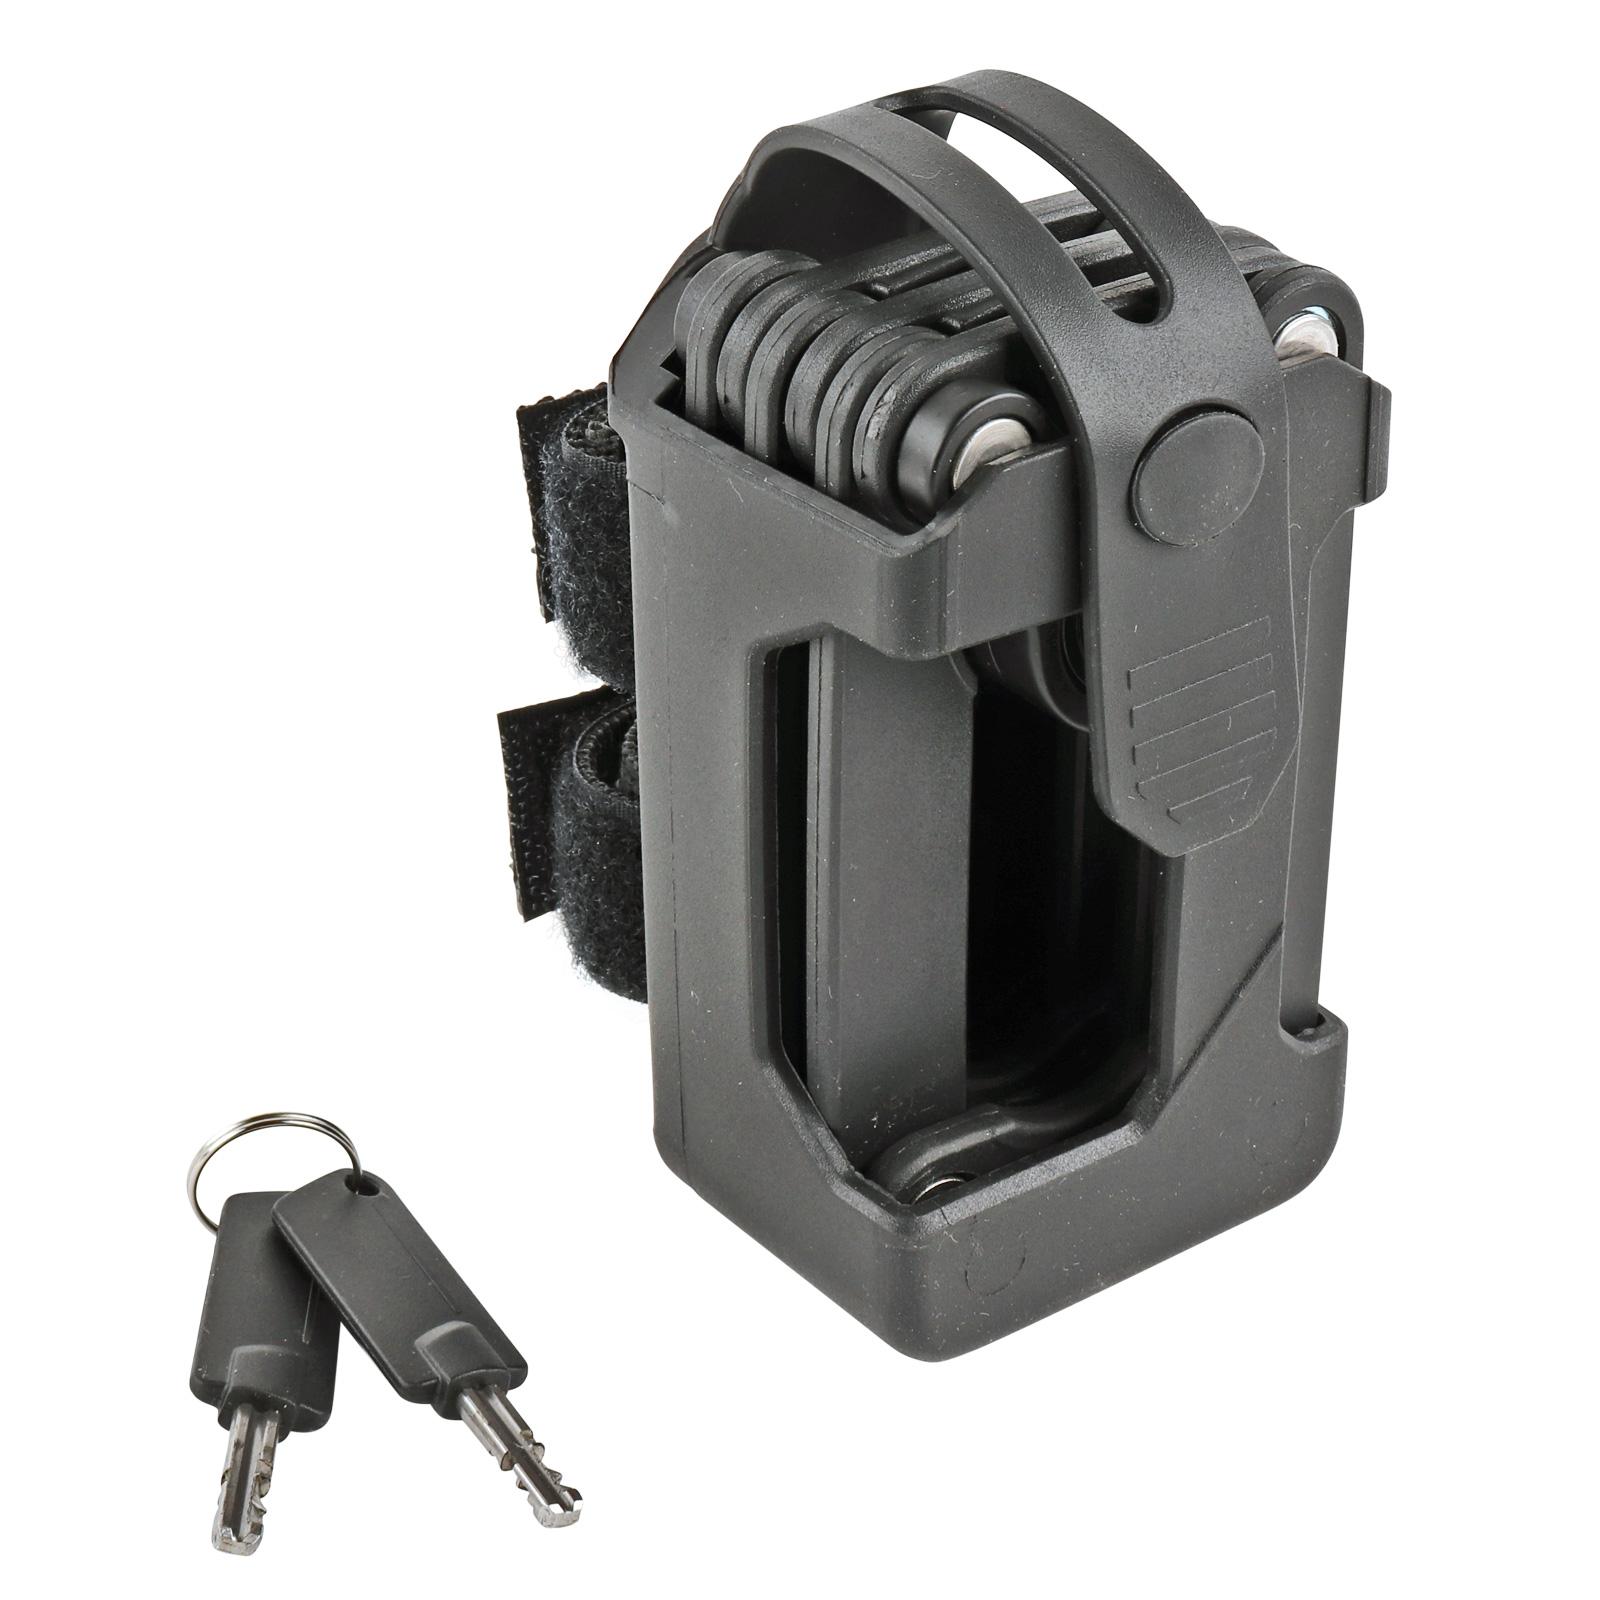 Fahrrad-Faltschloss CONTEC, gehärteter Stahl, Sicherheitsstufe 7